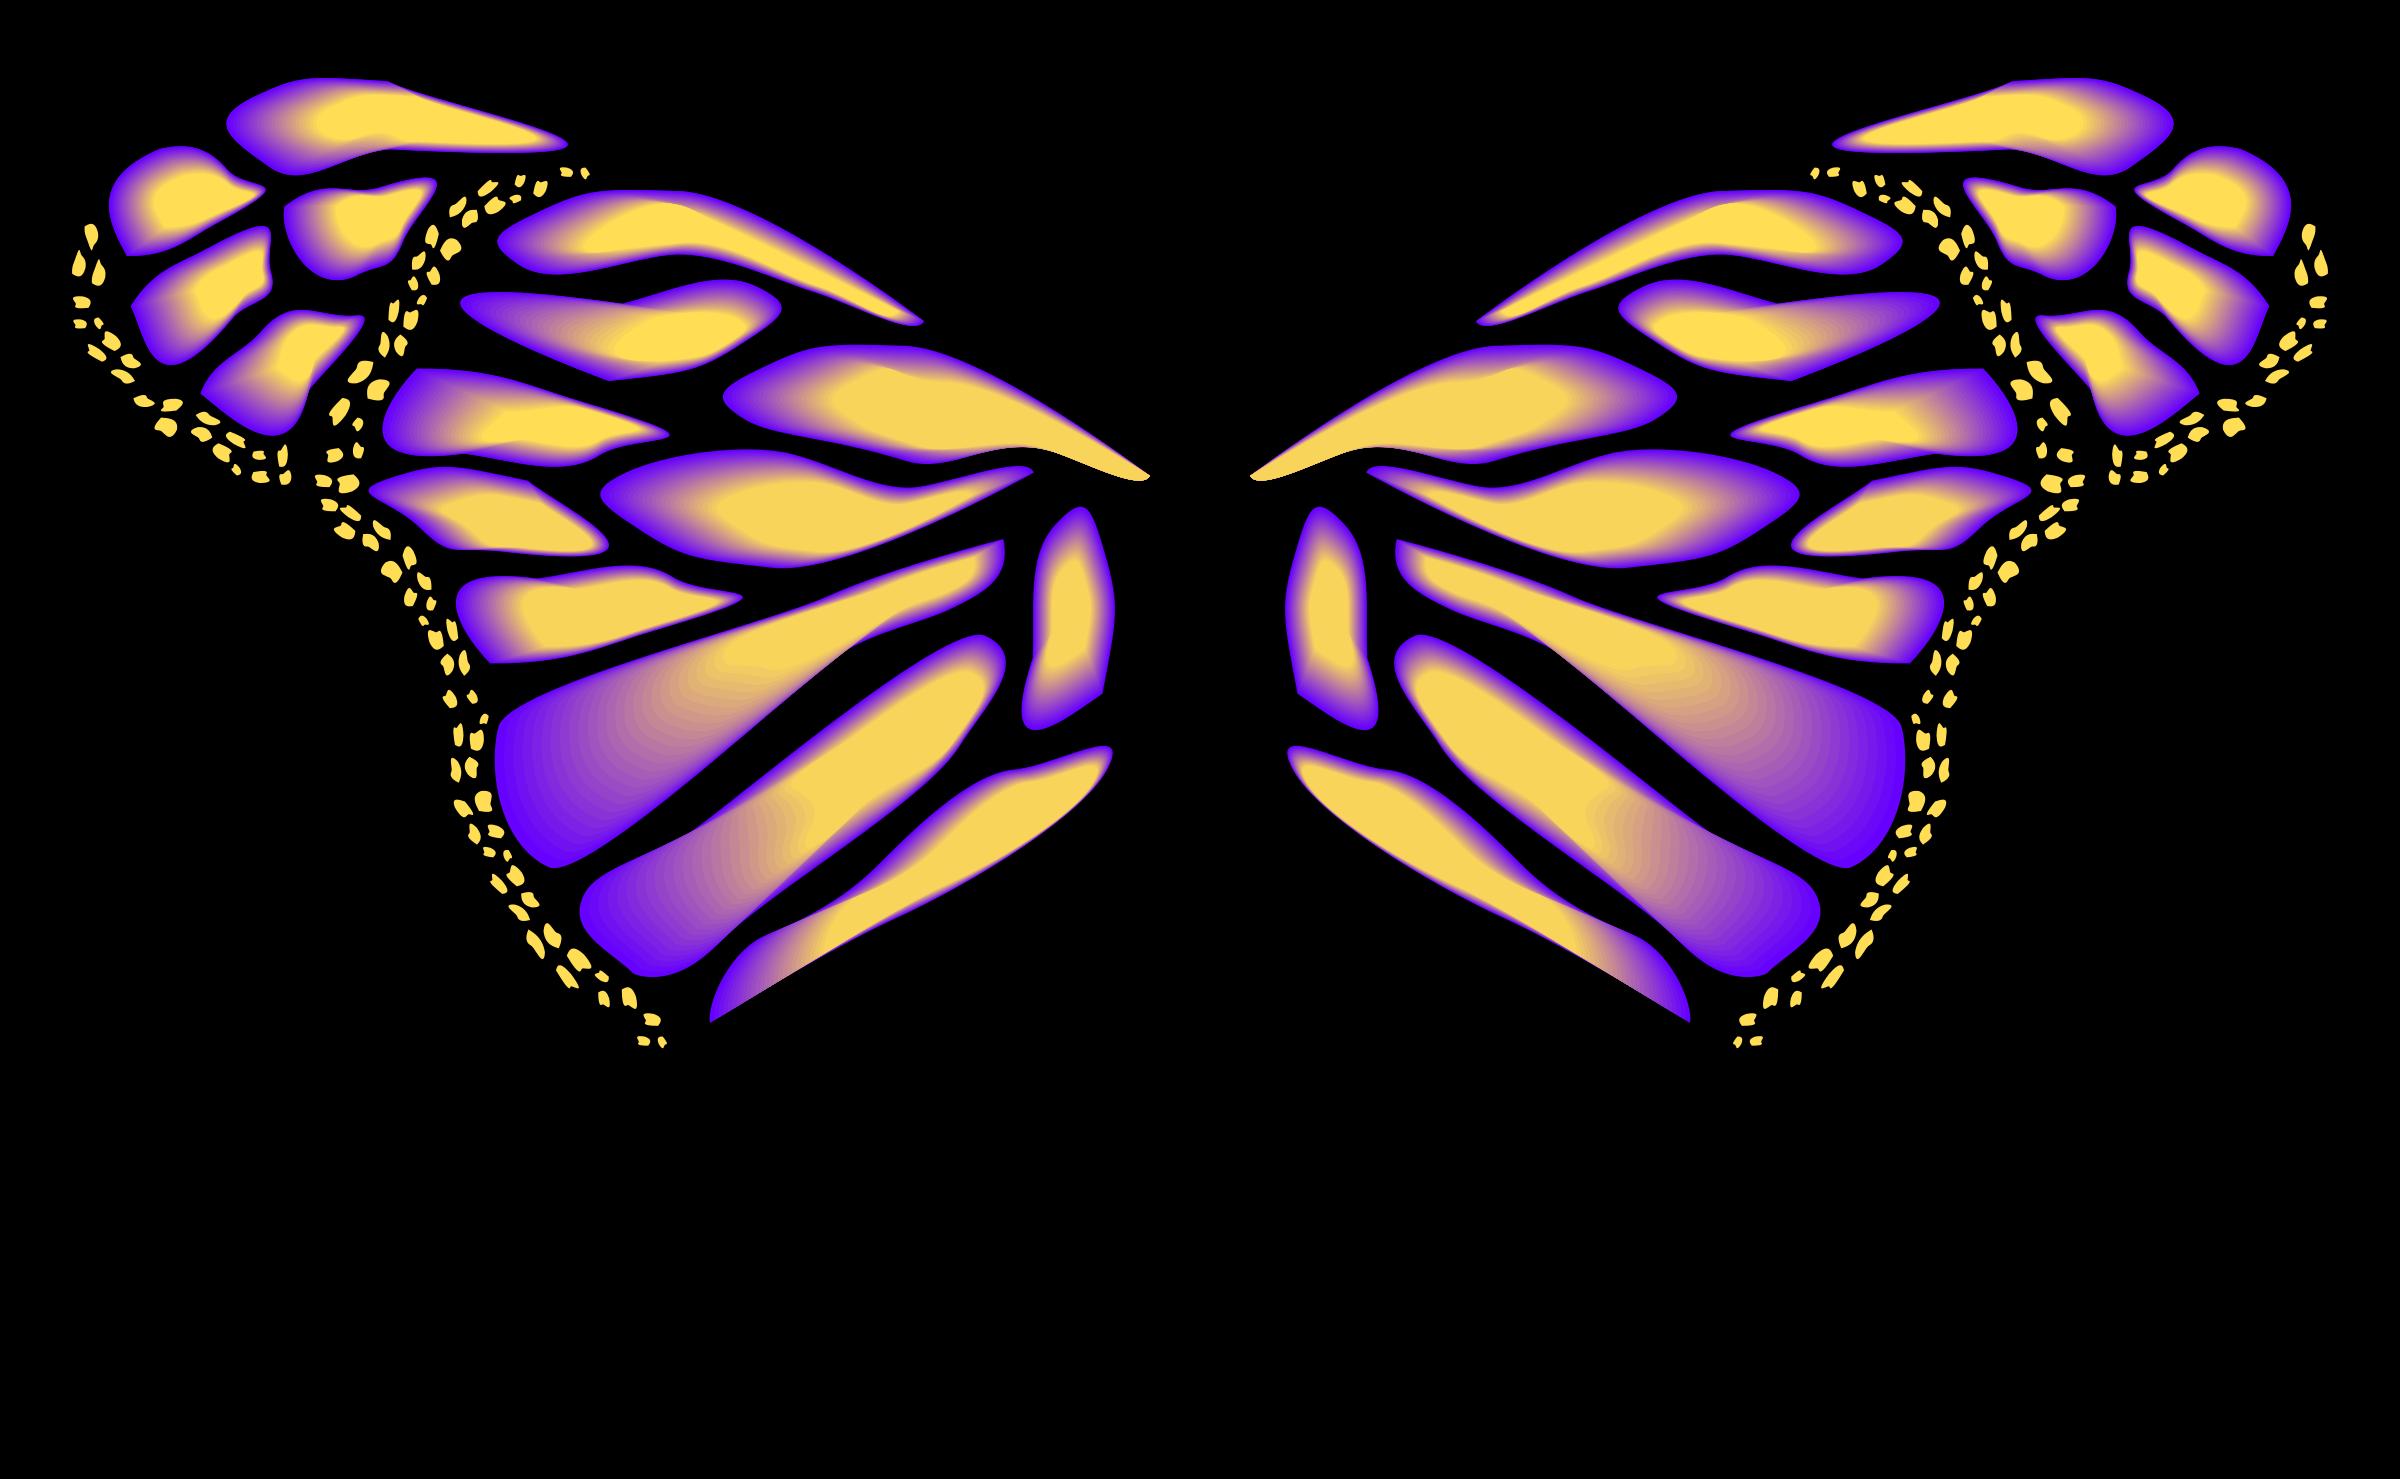 Clipart Asas De Borboleta Fada Vetor Butterfly Fairy Wings  -> Borboleta Vetor